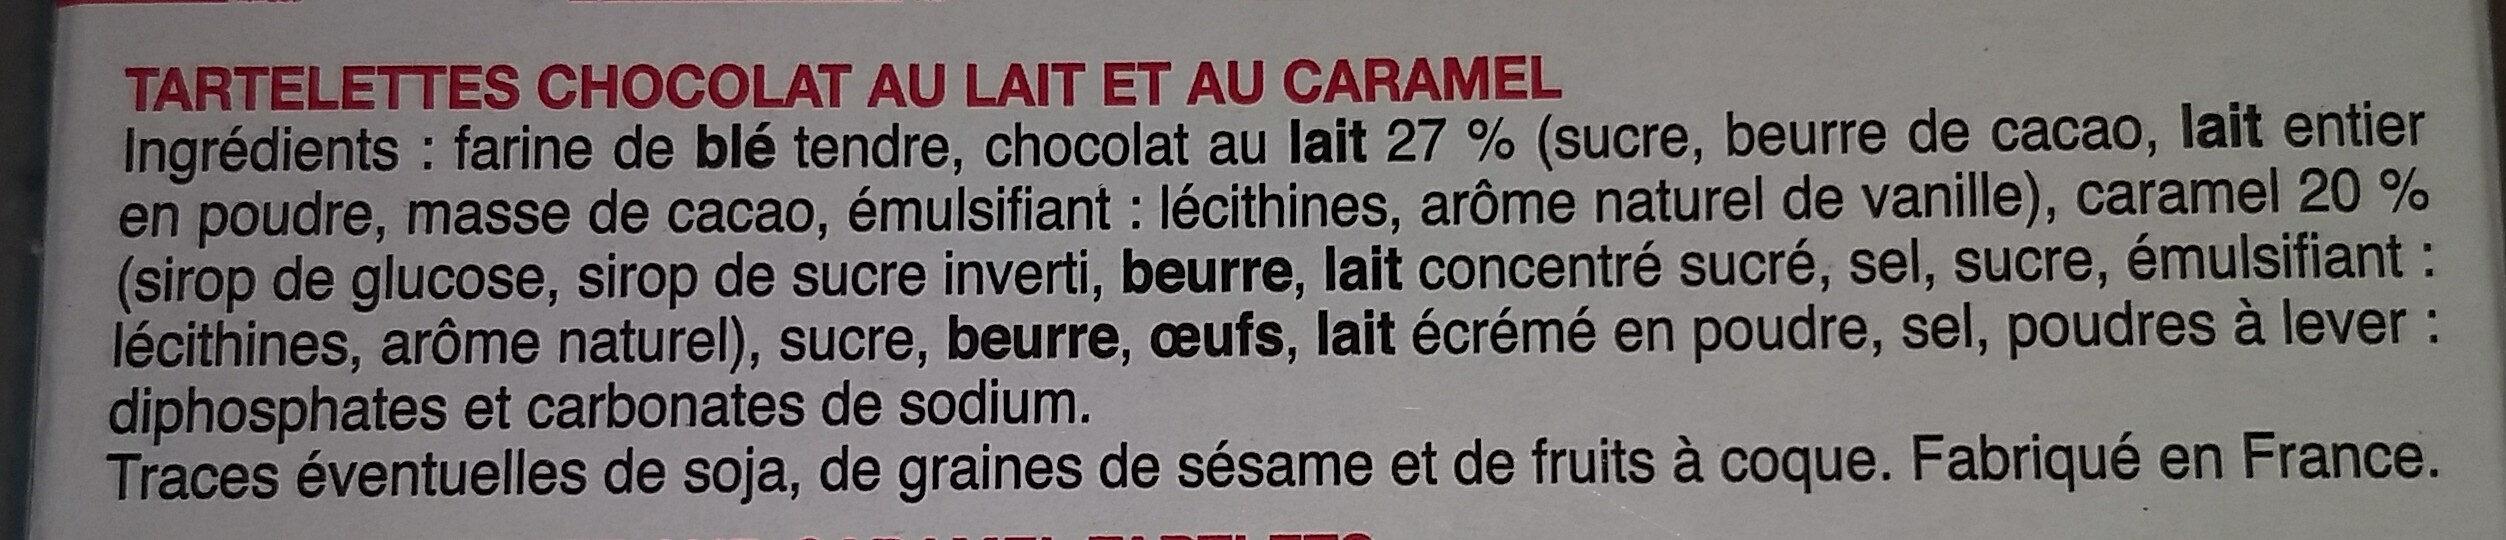 Tartelettes choco caramel - Ingrédients - fr